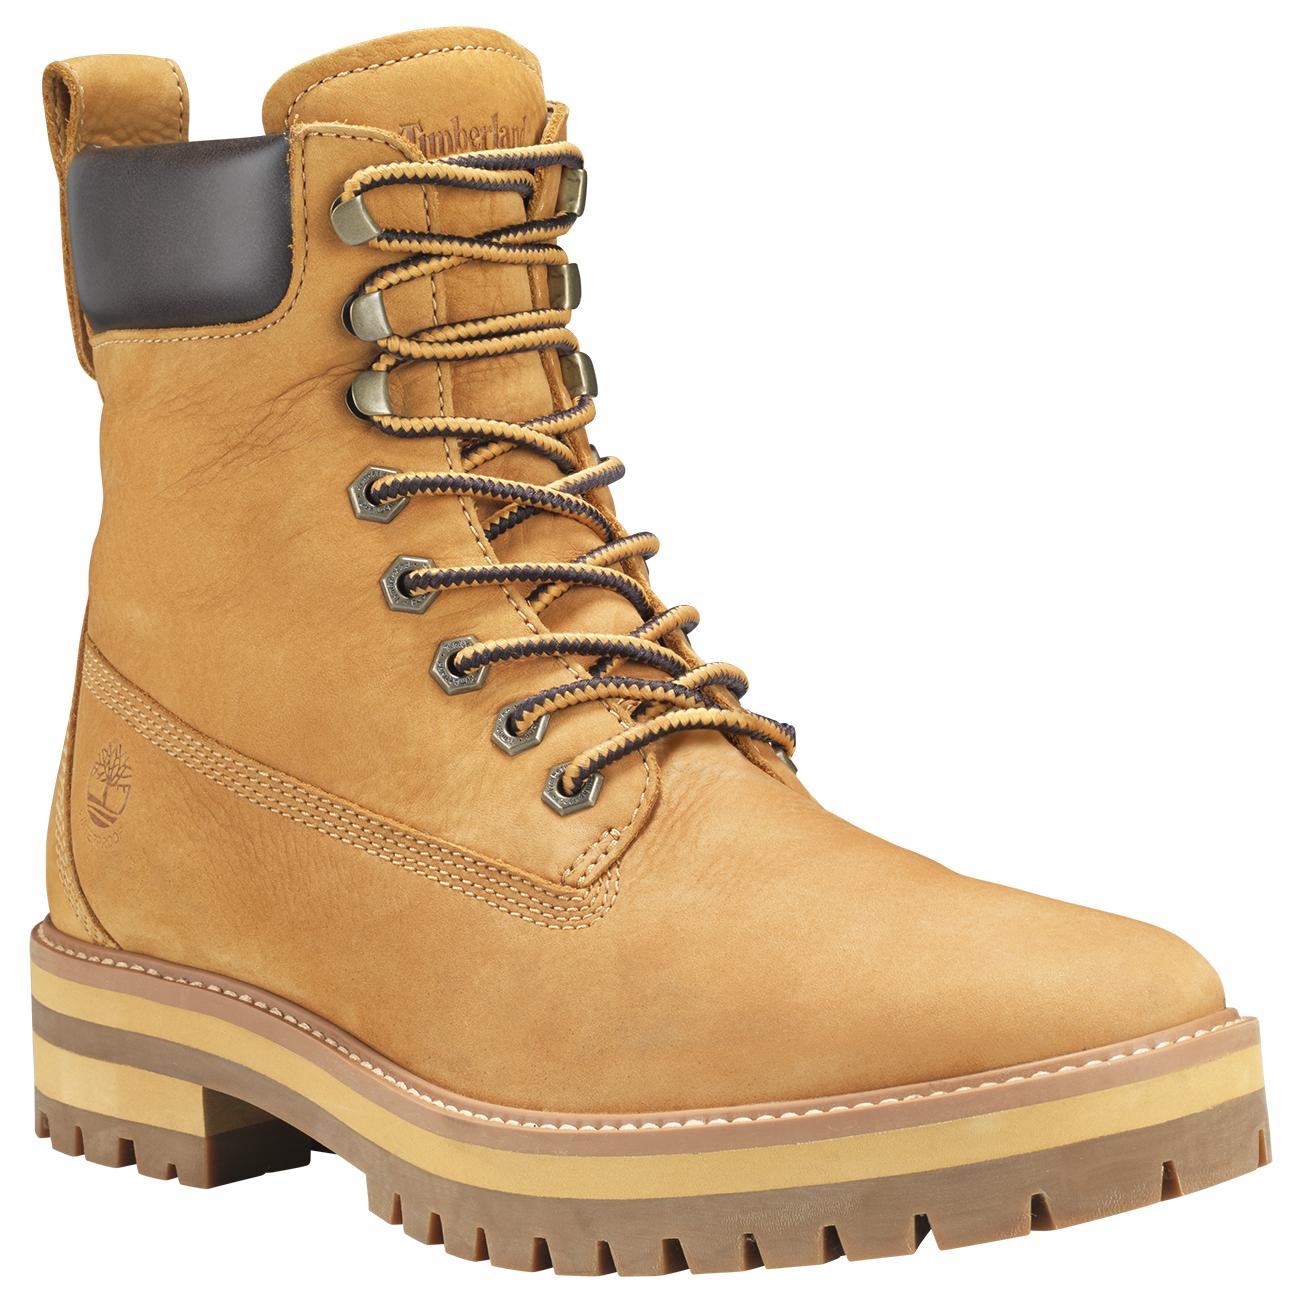 Mens Timberland Courma Guy Boot Walking Outdoor Hiking Waterproof Boot US 7.5-13